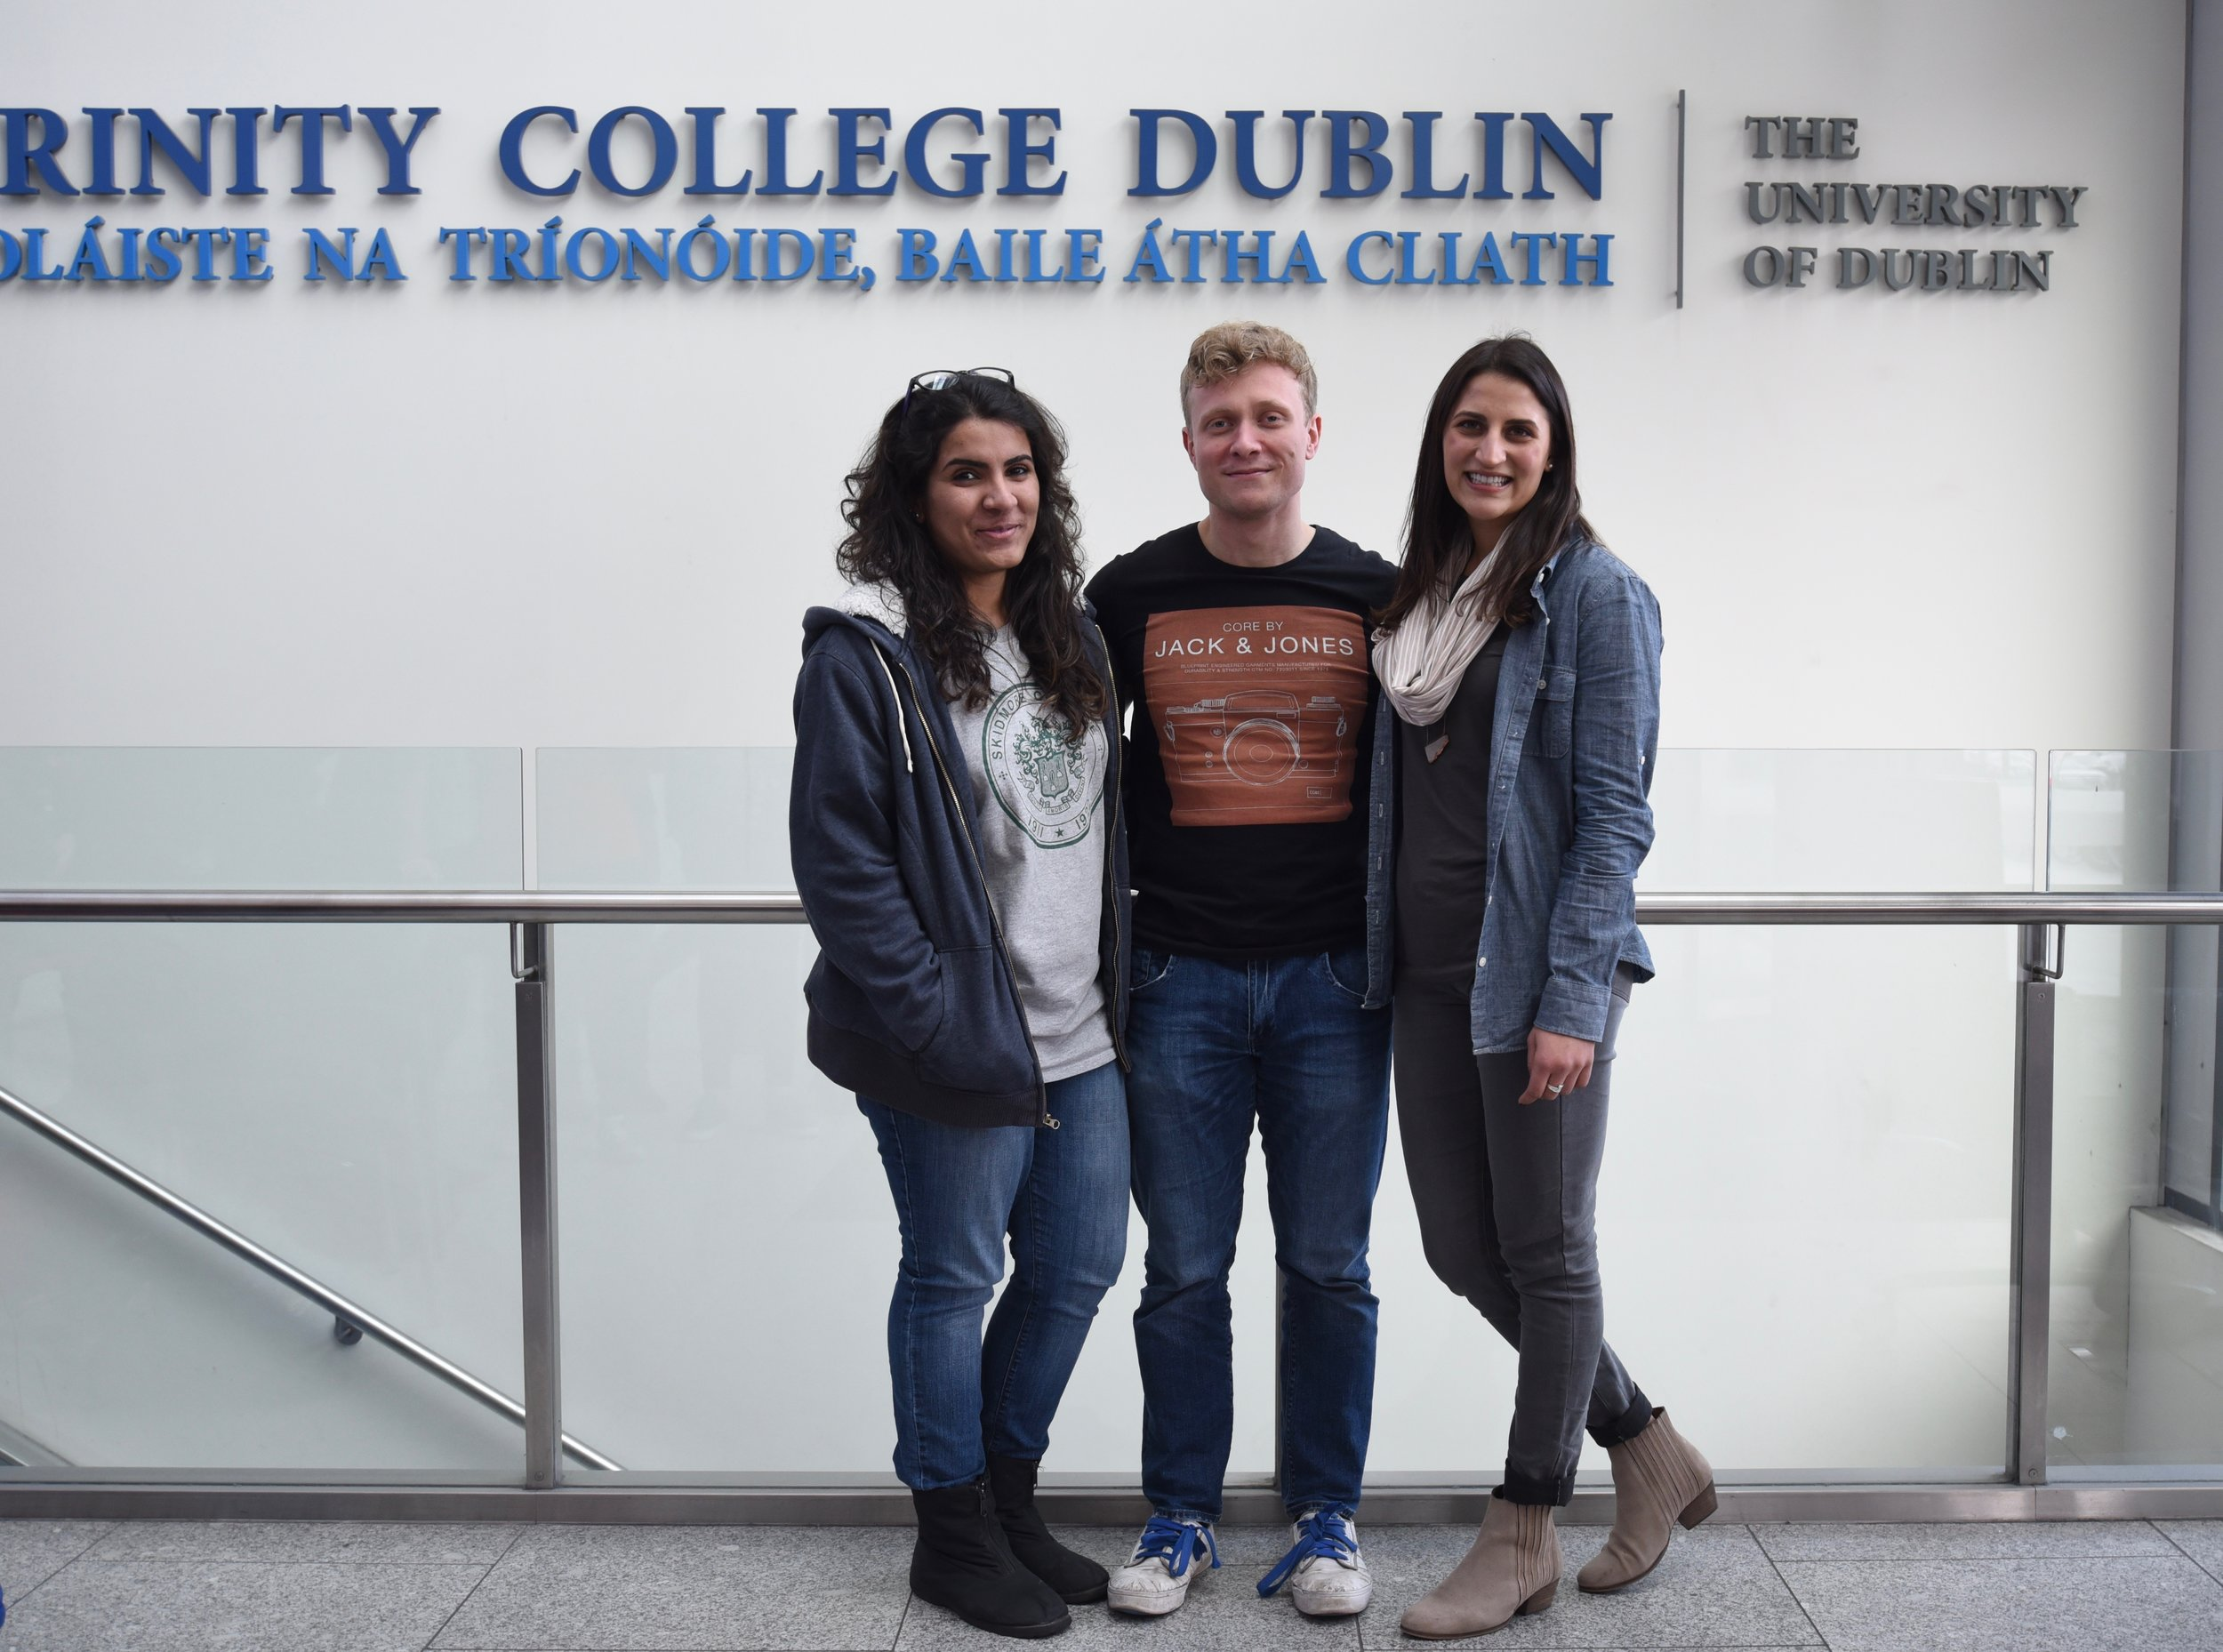 Group Z - Surbhi Hablani, Bruce Mckee, and Caroline Patel